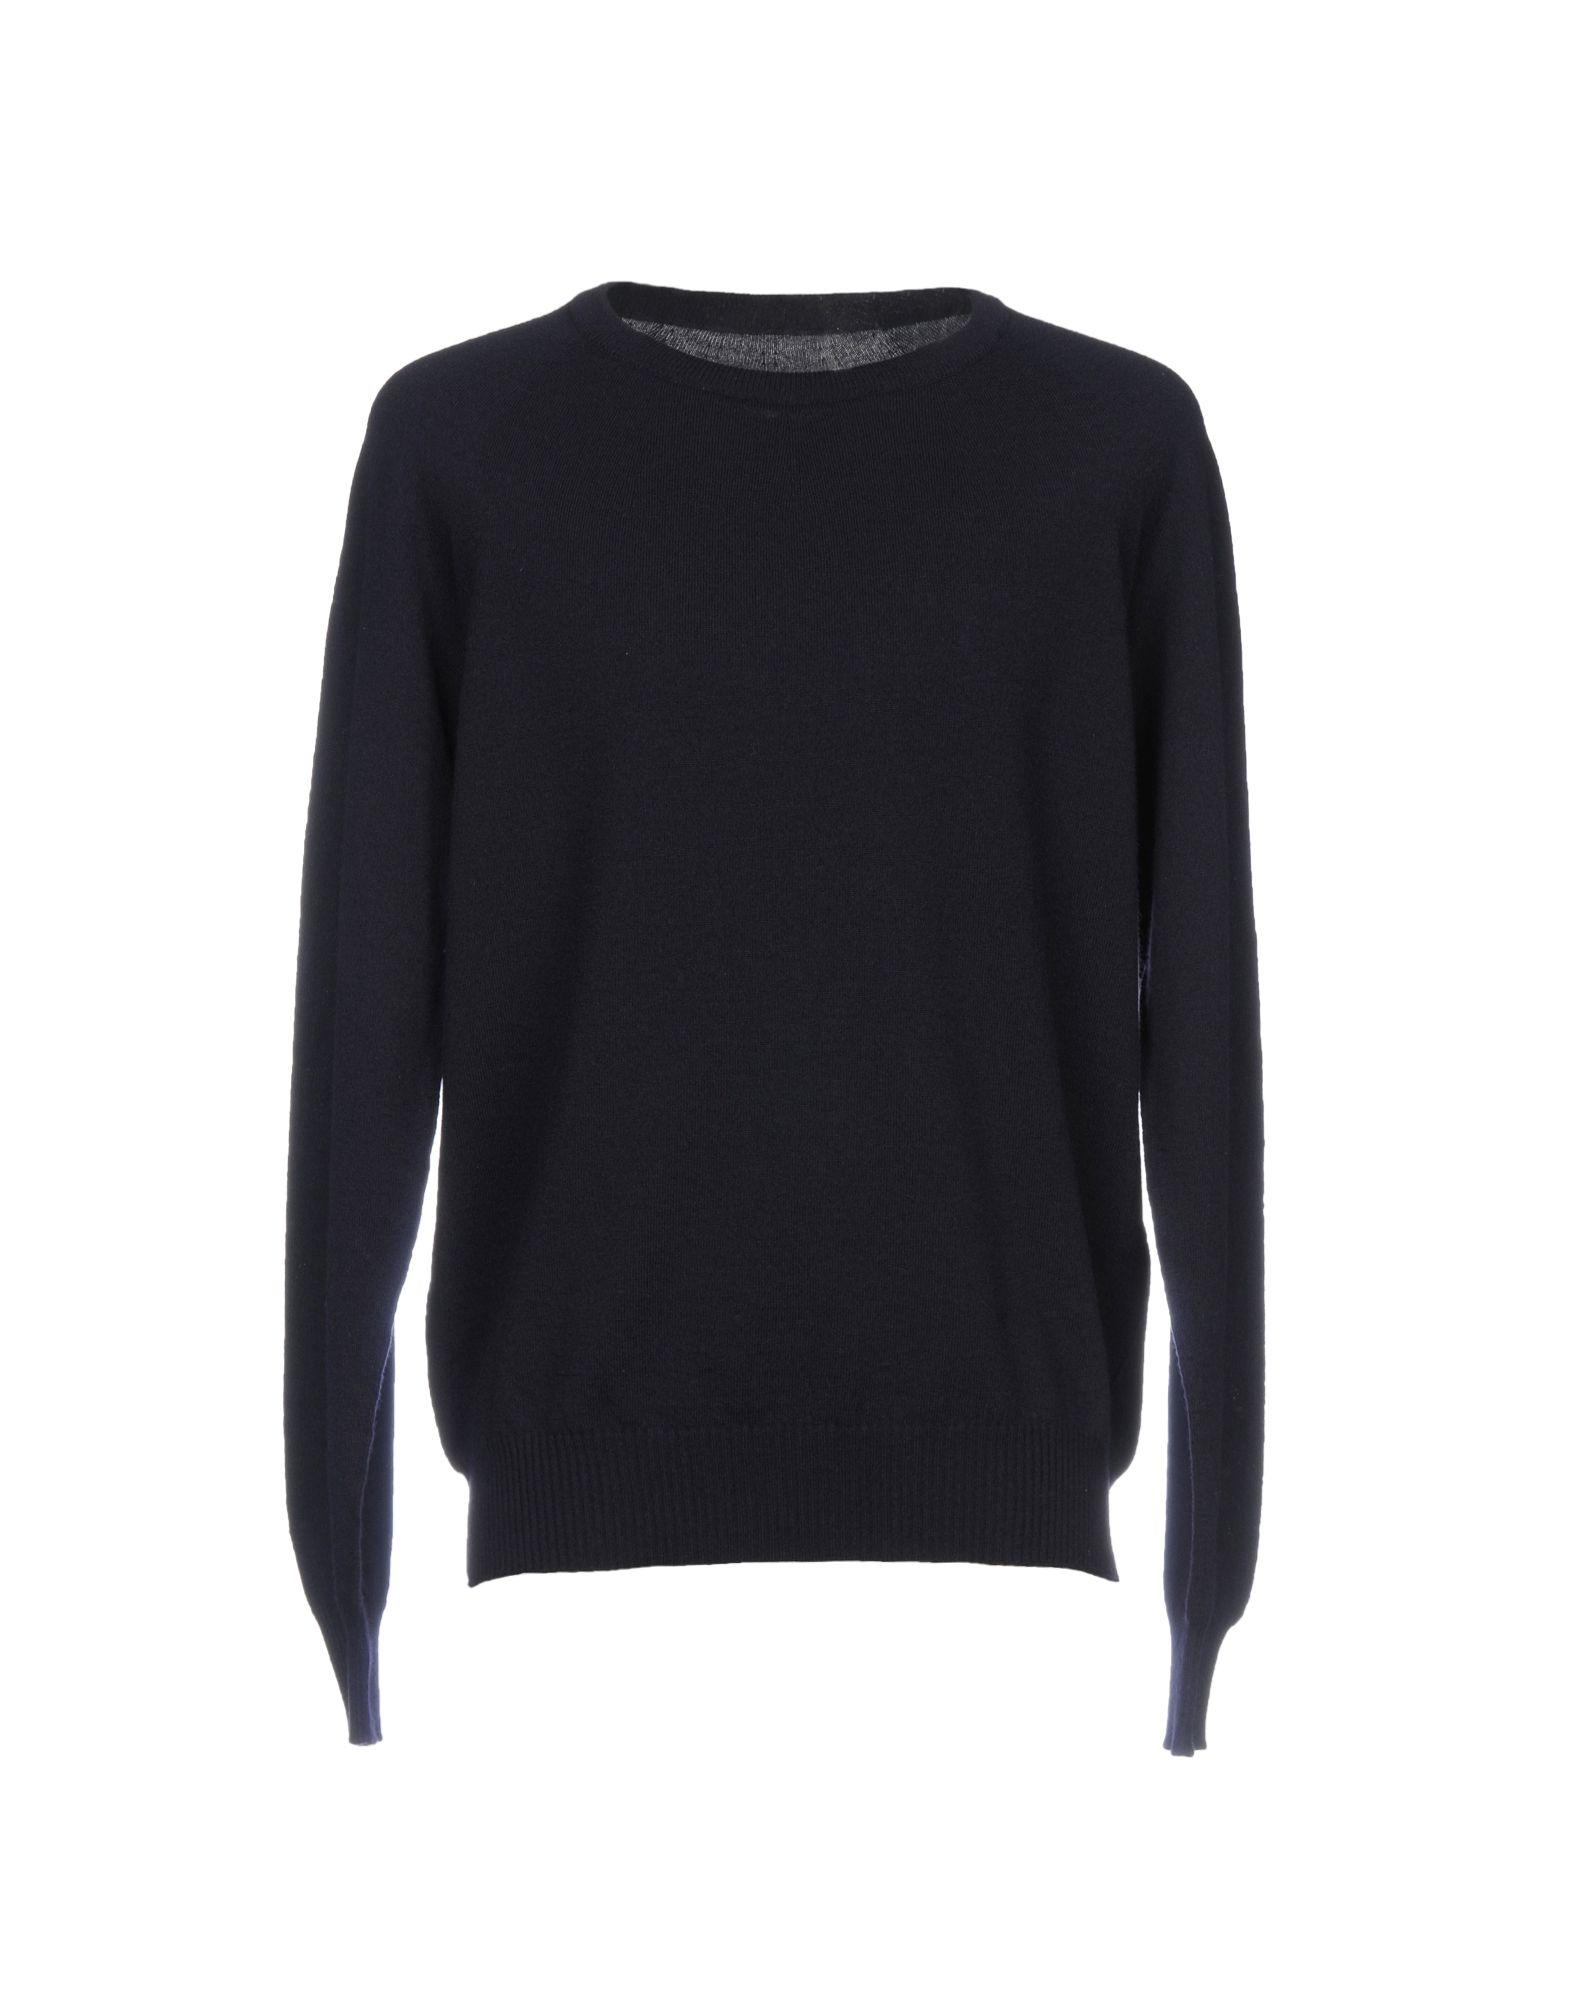 Maison Margiela Sweater In Dark Blue